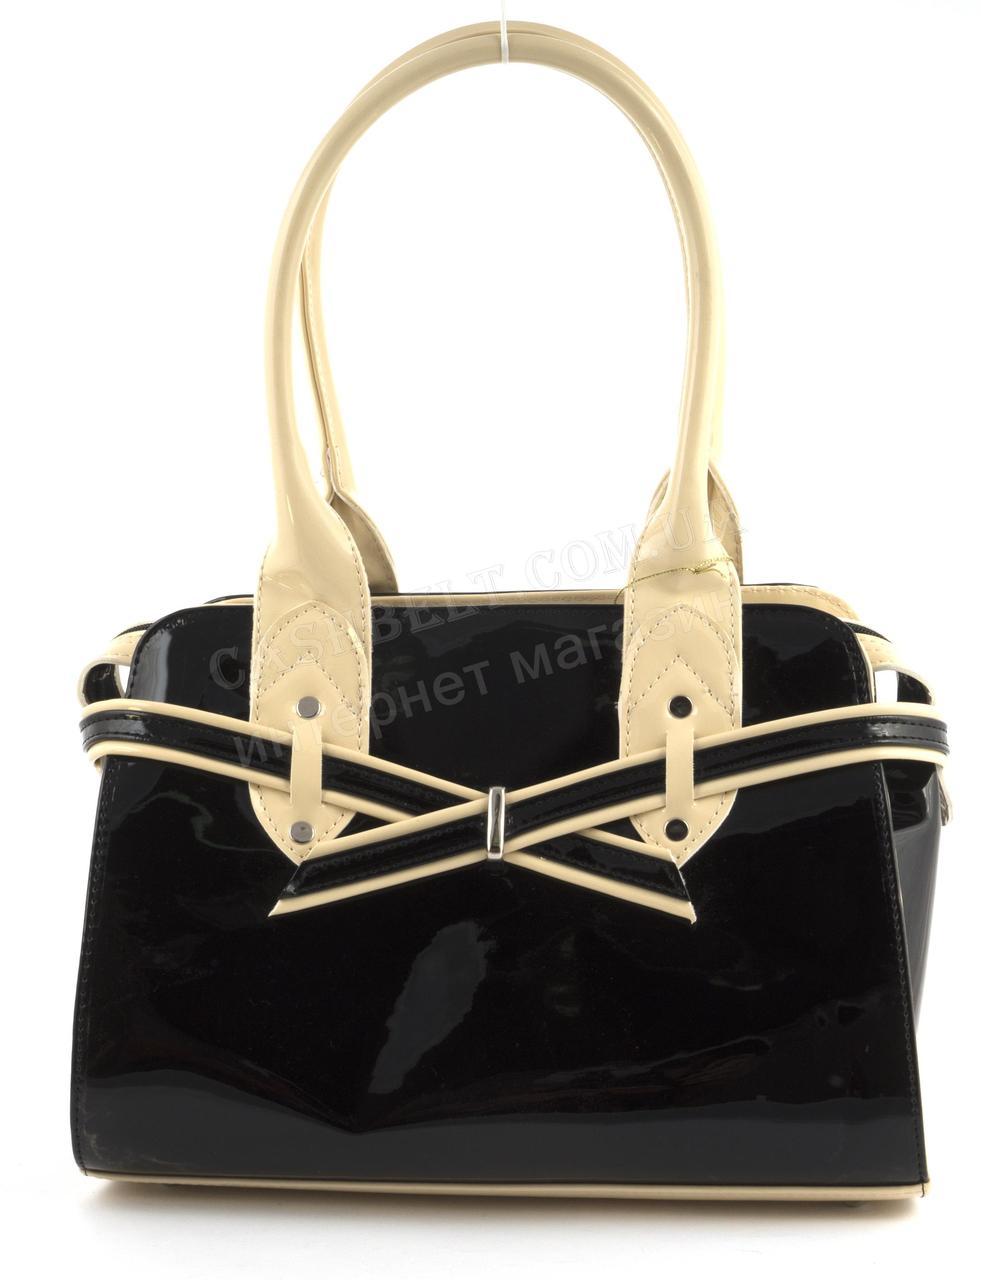 4a19f90637a8 Каркасная стильная качественная лаковая двухцветная сумка ZGARDA art. 18-14  черная/бежевая Украина